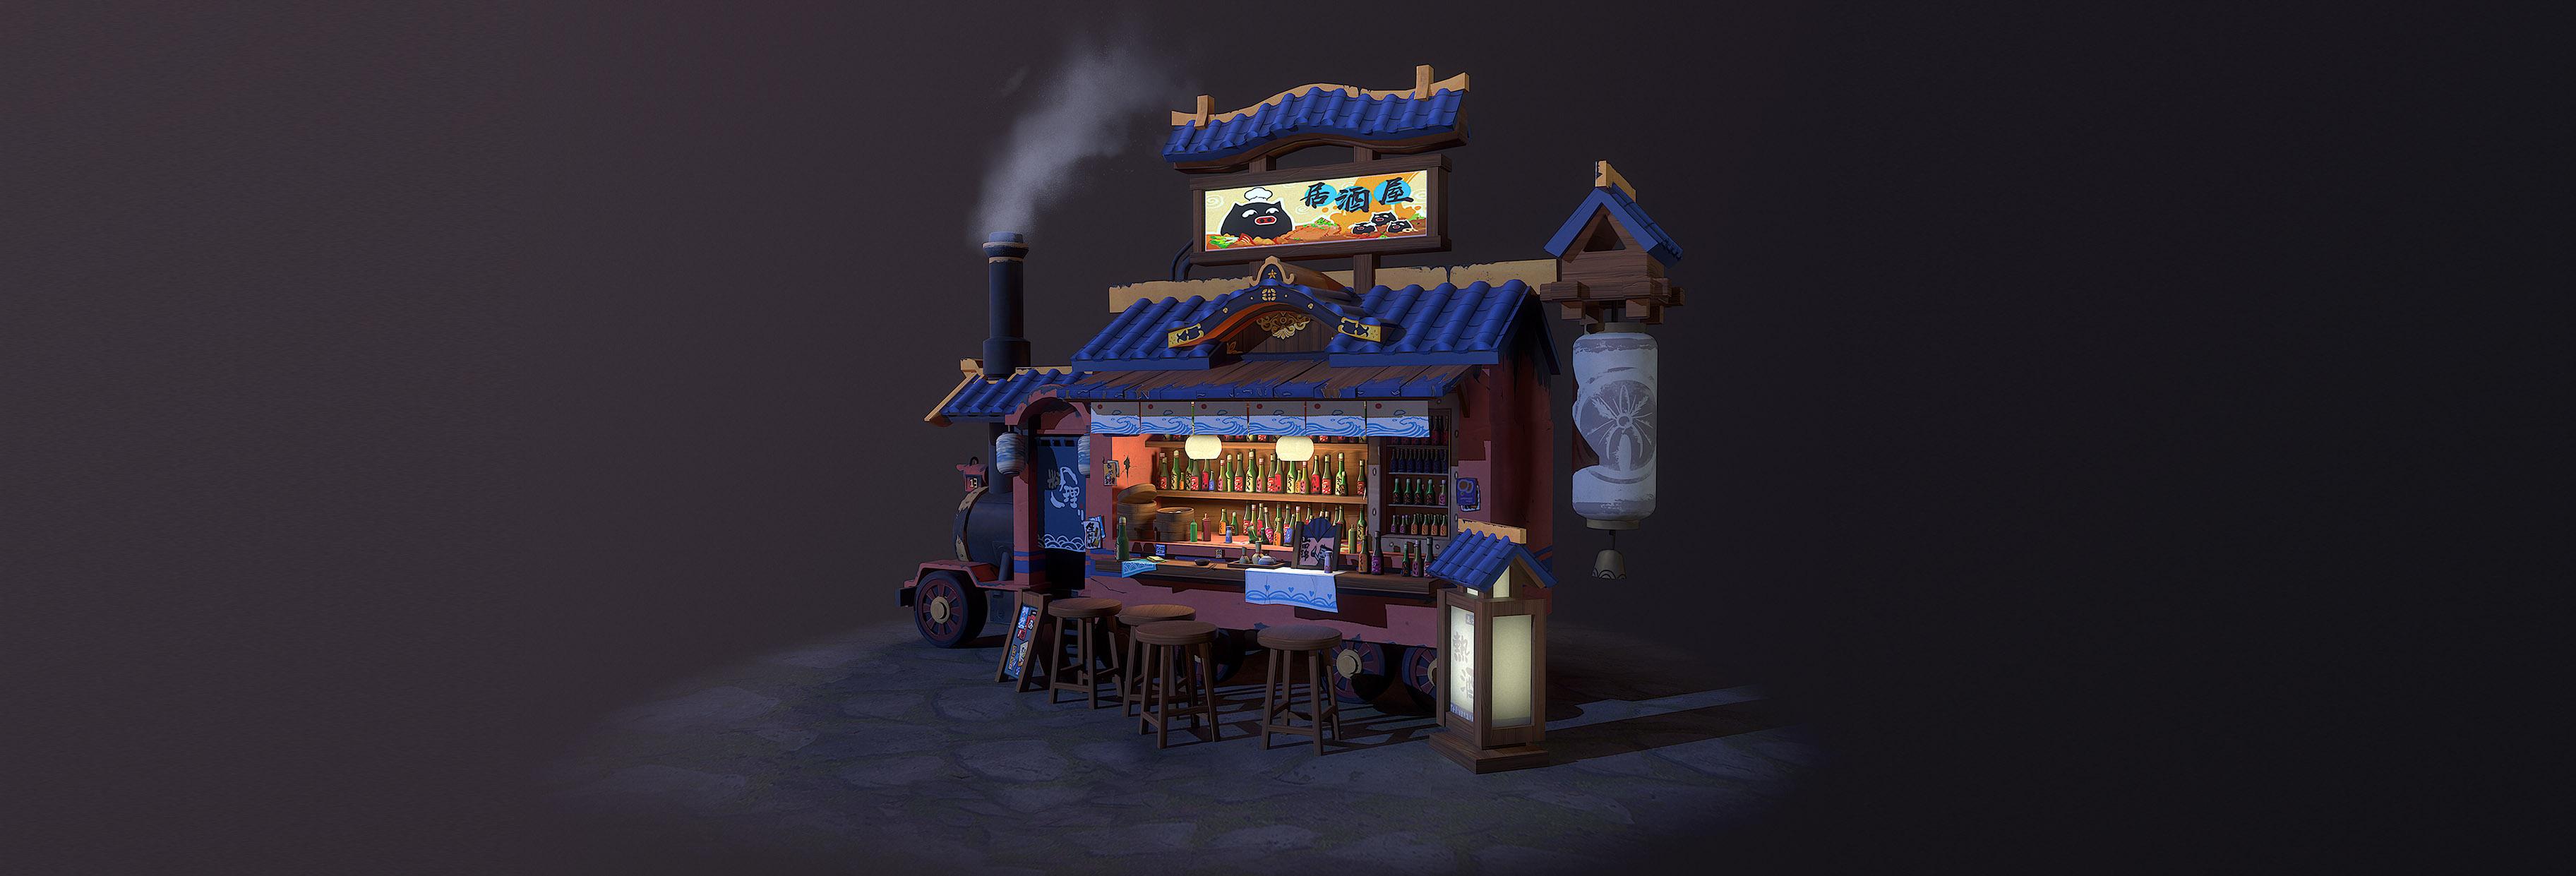 Train tavern by Jielin Shen